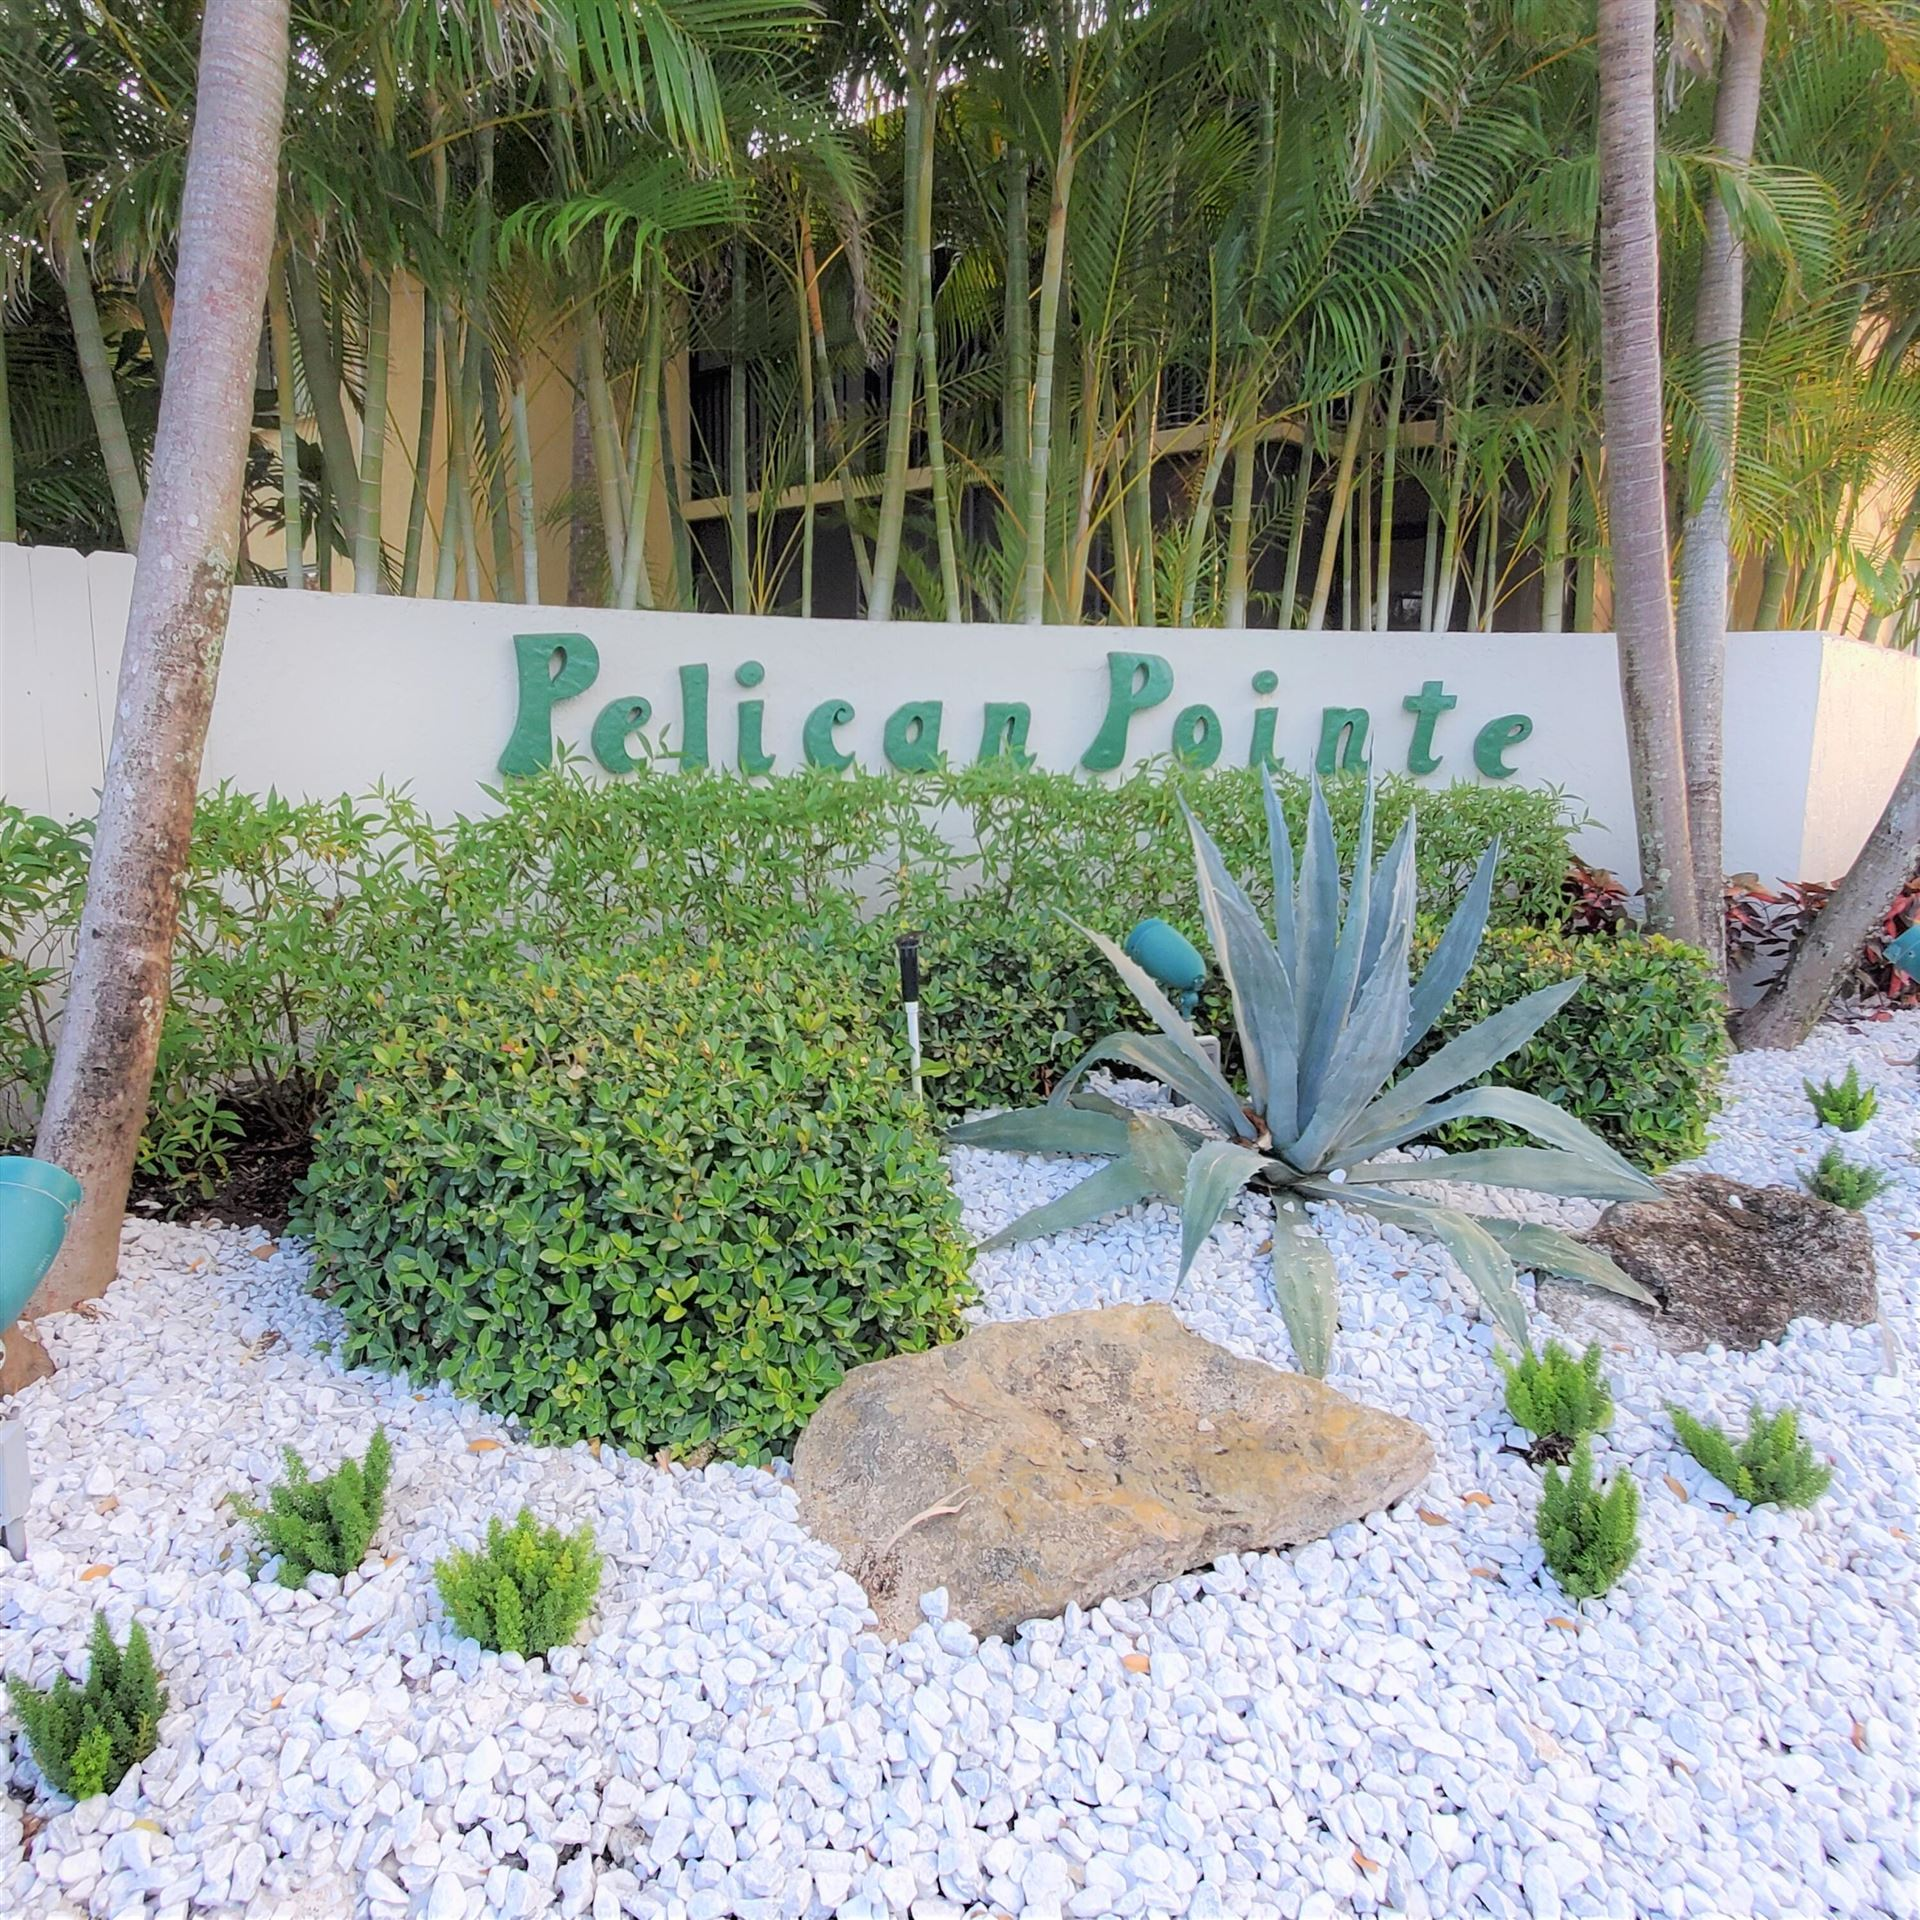 30 Pelican Pointe Drive #203, Delray Beach, FL 33483 - MLS#: RX-10721708